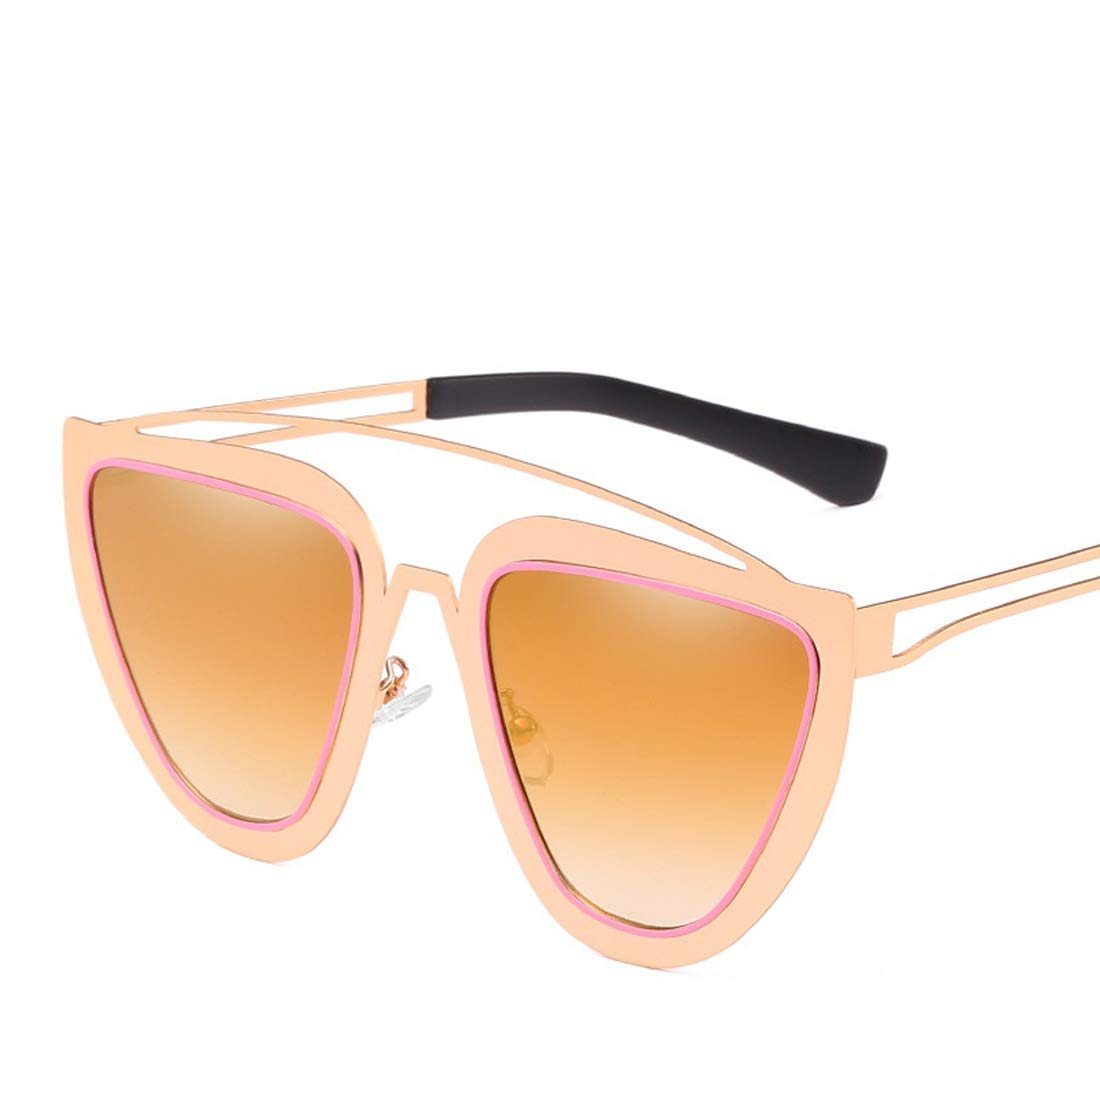 Wsunglass Fashion Cat Eye Sunglasses retro fashion ladies stainless steel sunglasses sunglasses the same batch/_2